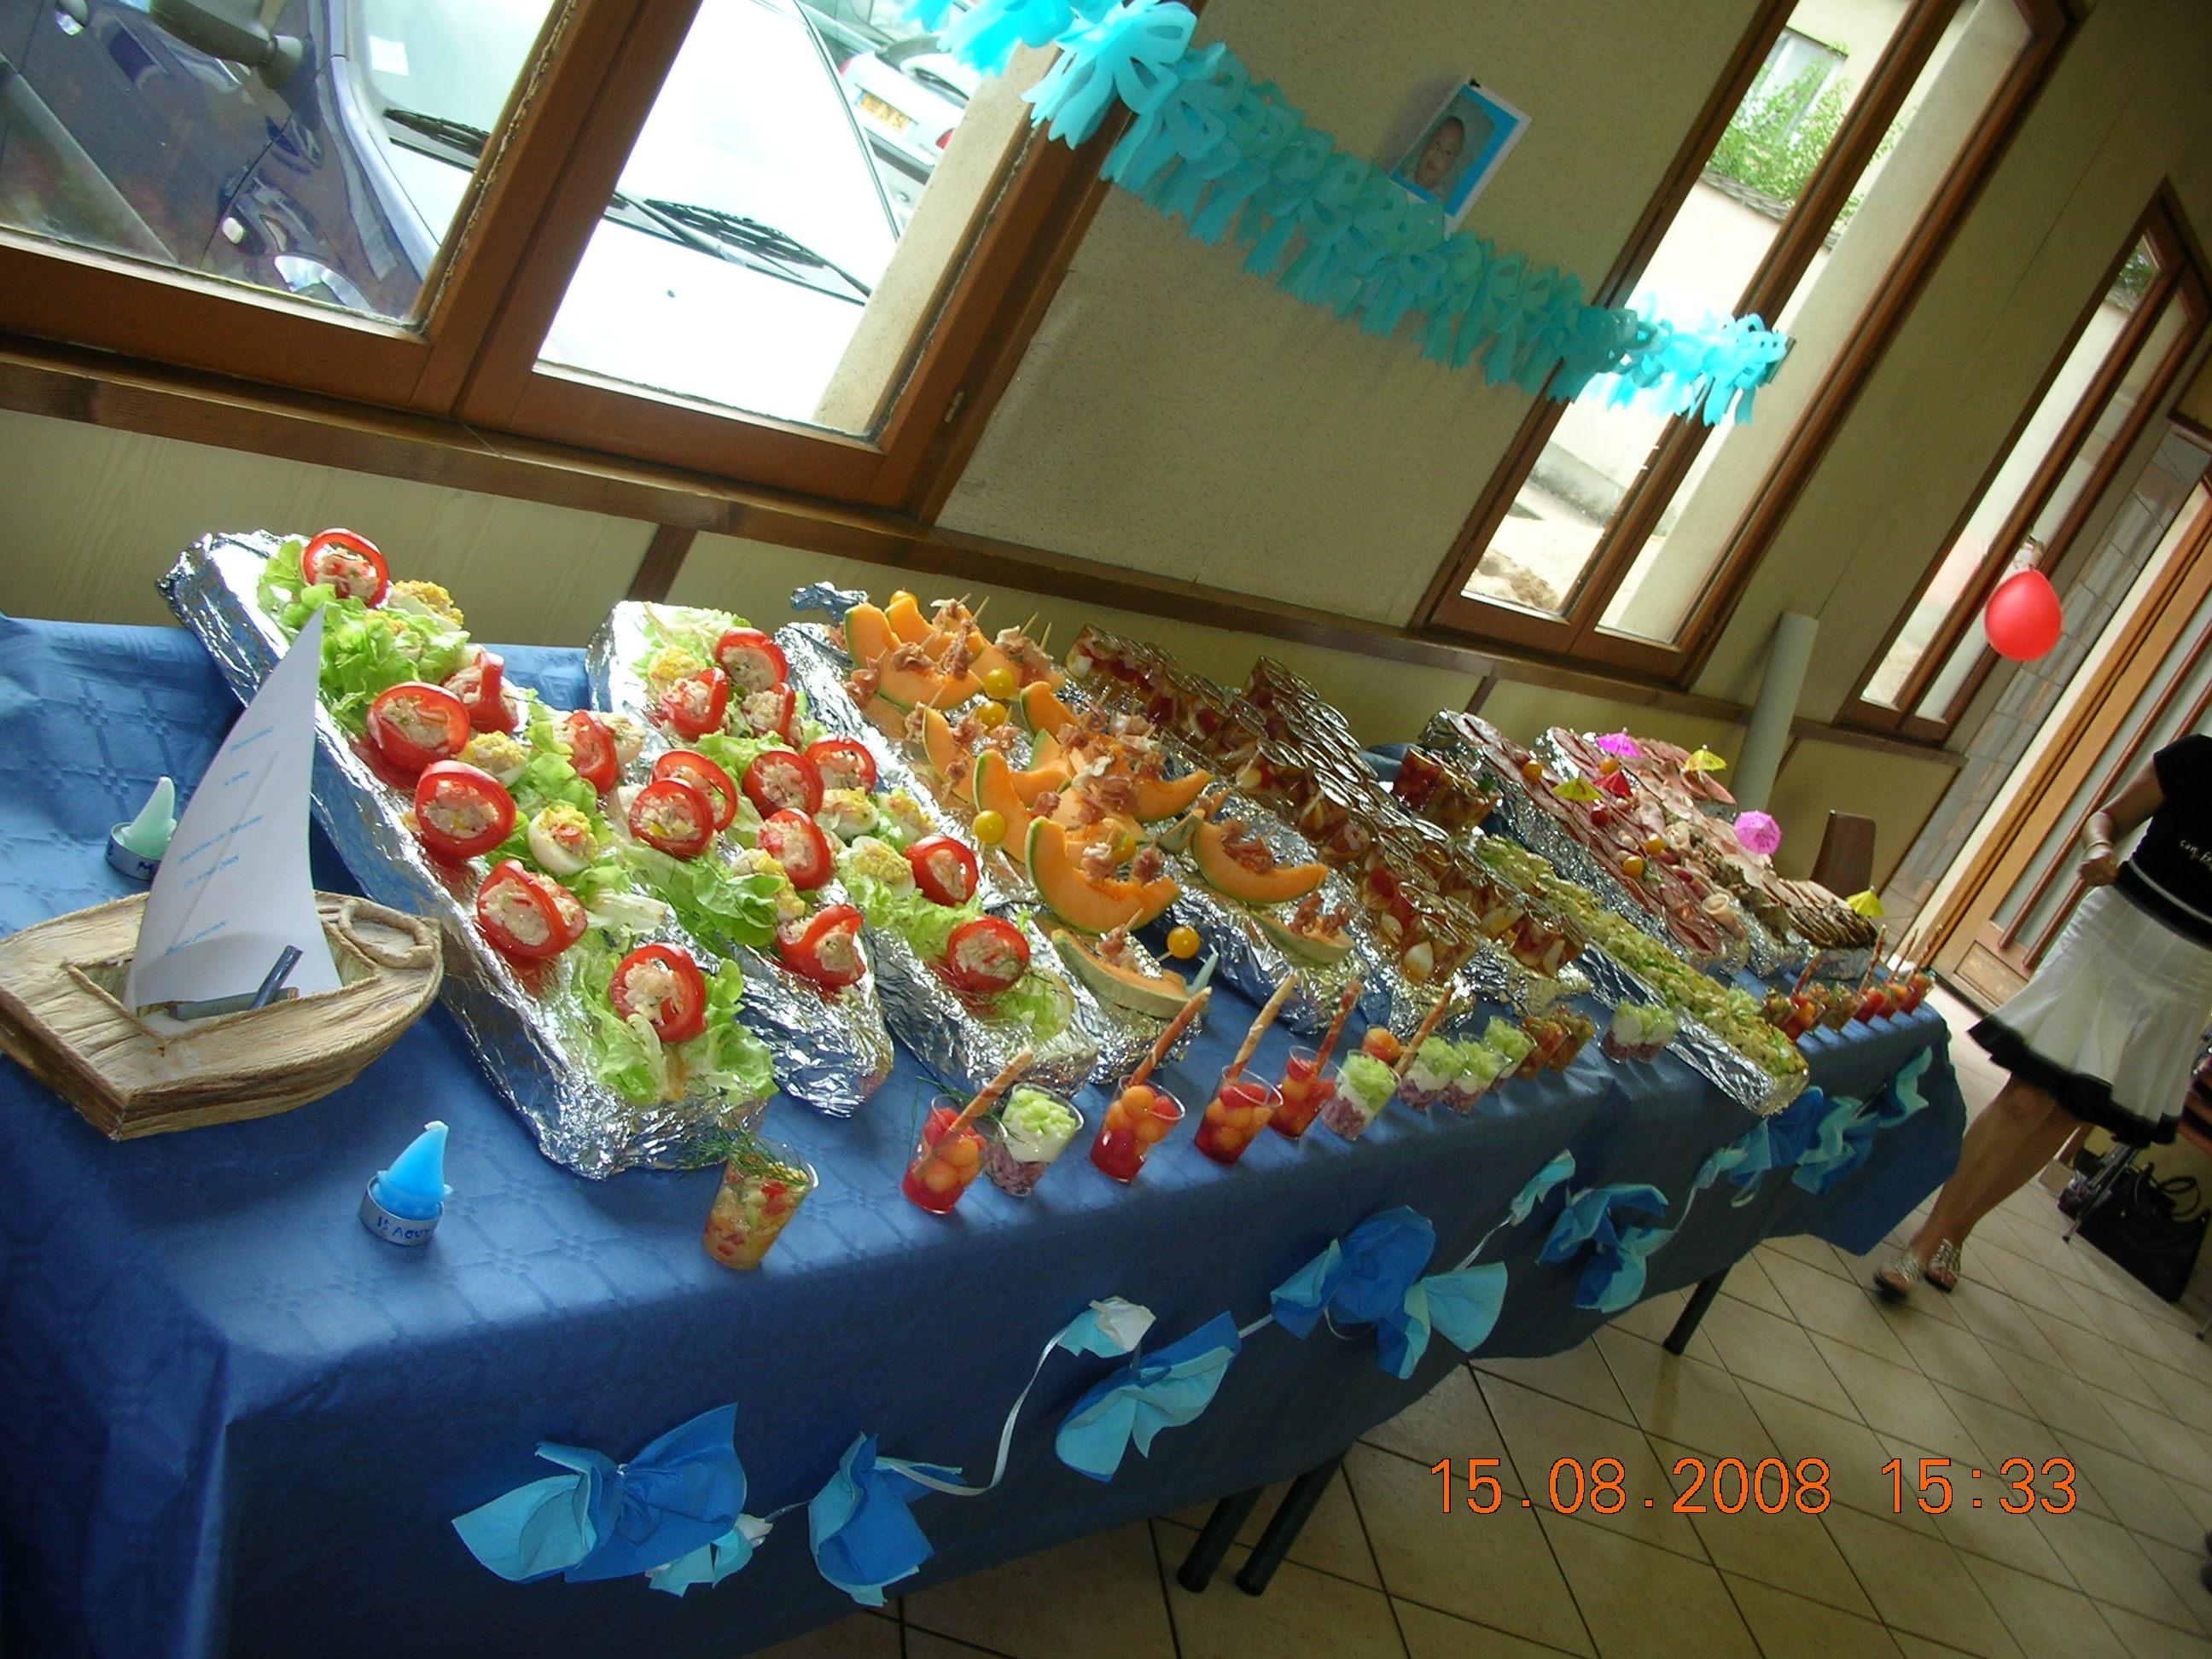 Luxury buffet anniversaire pas cher pictures for Idee repas convivial pas cher